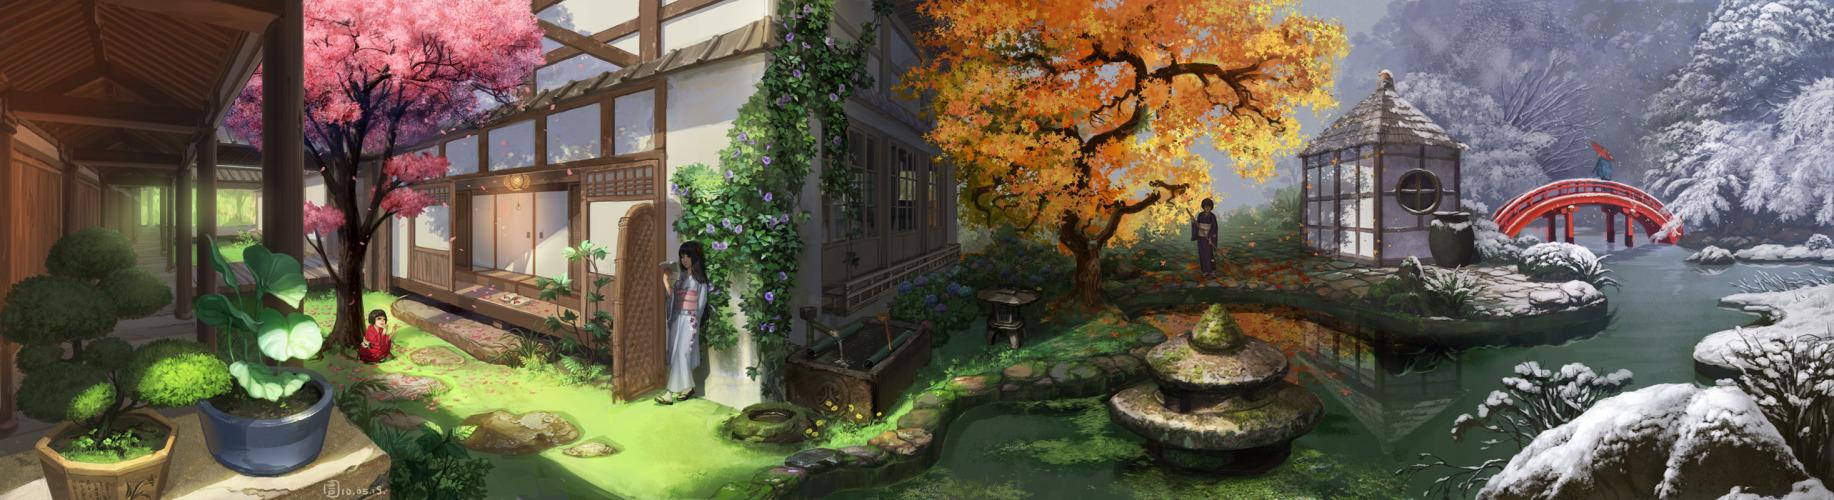 anime dual monitor wallpaper | Tumblr